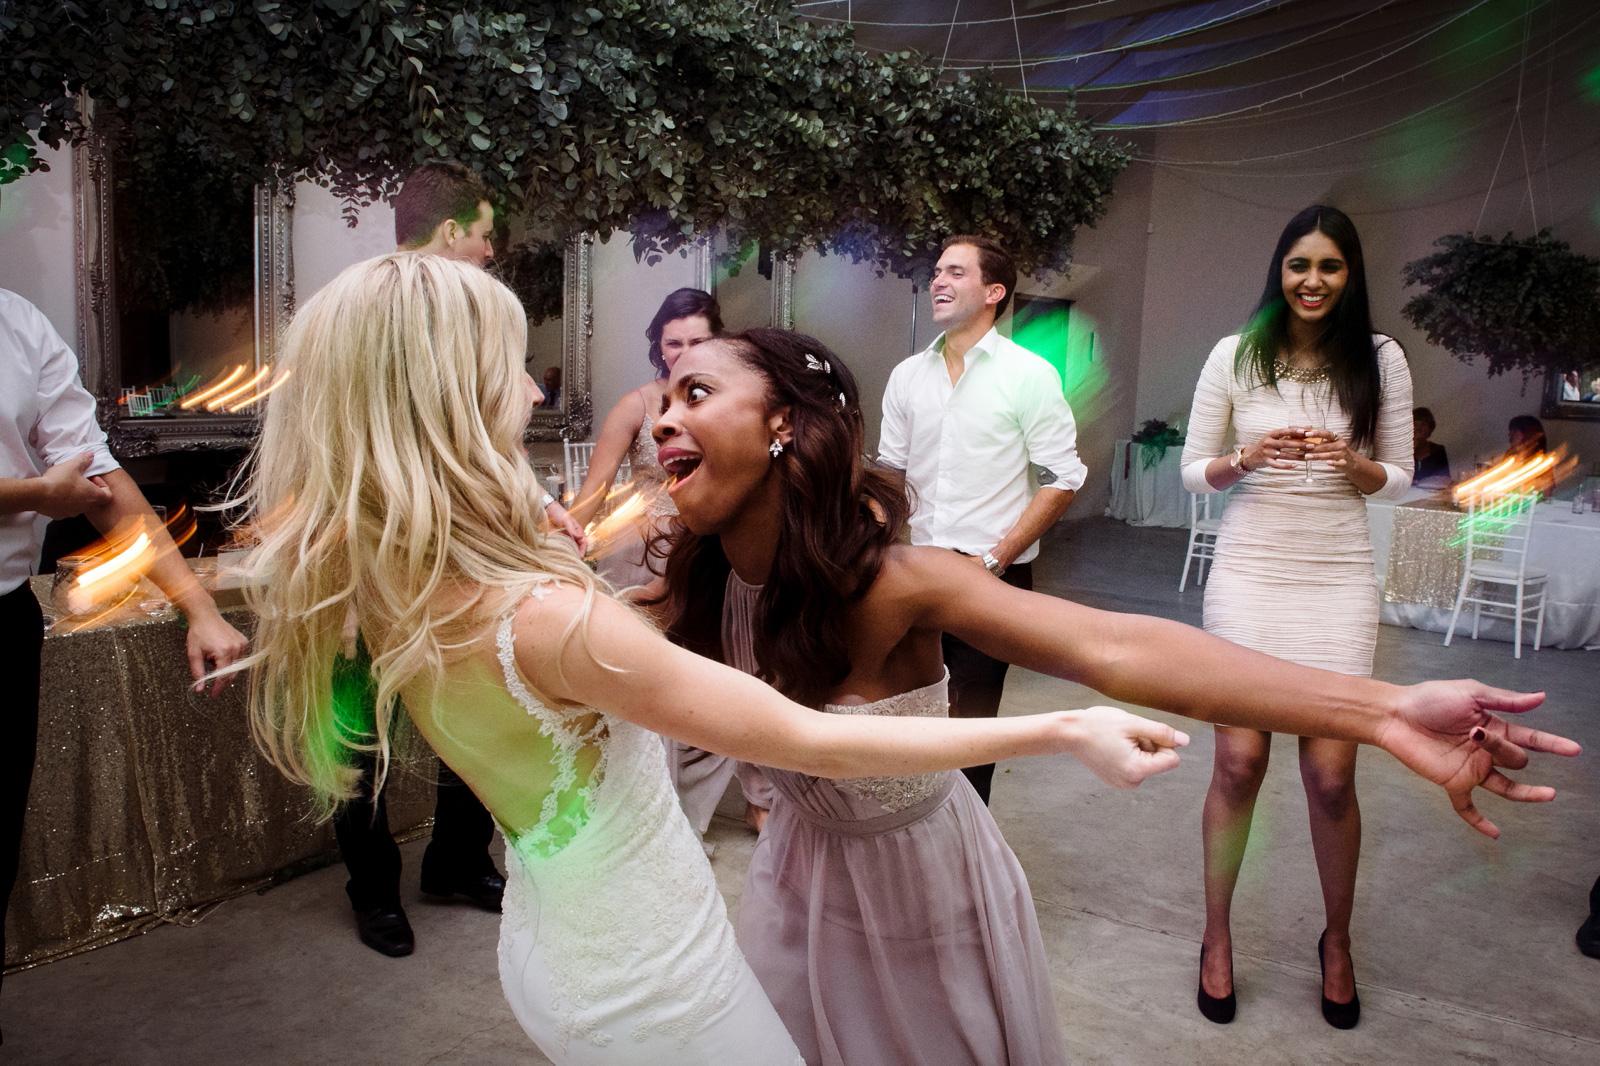 Drunk wedding dancing